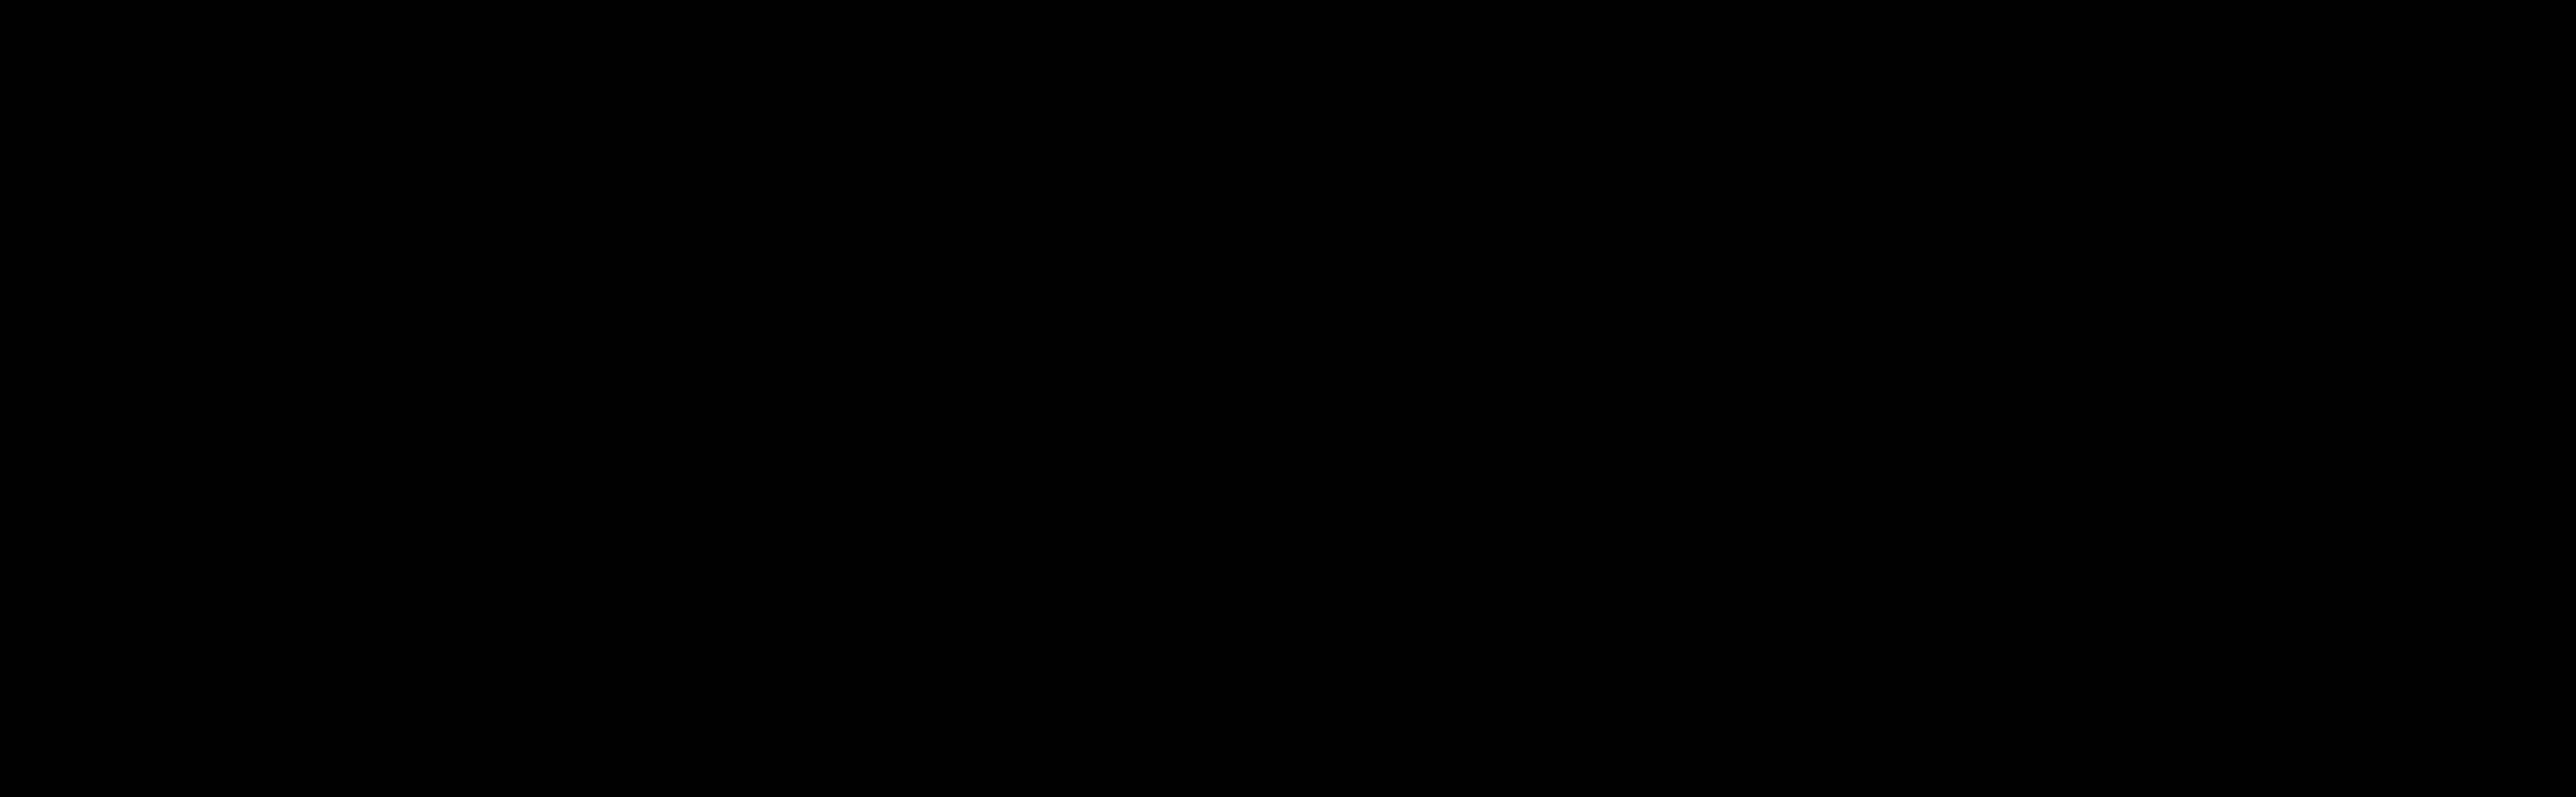 Netezis Digital Agency